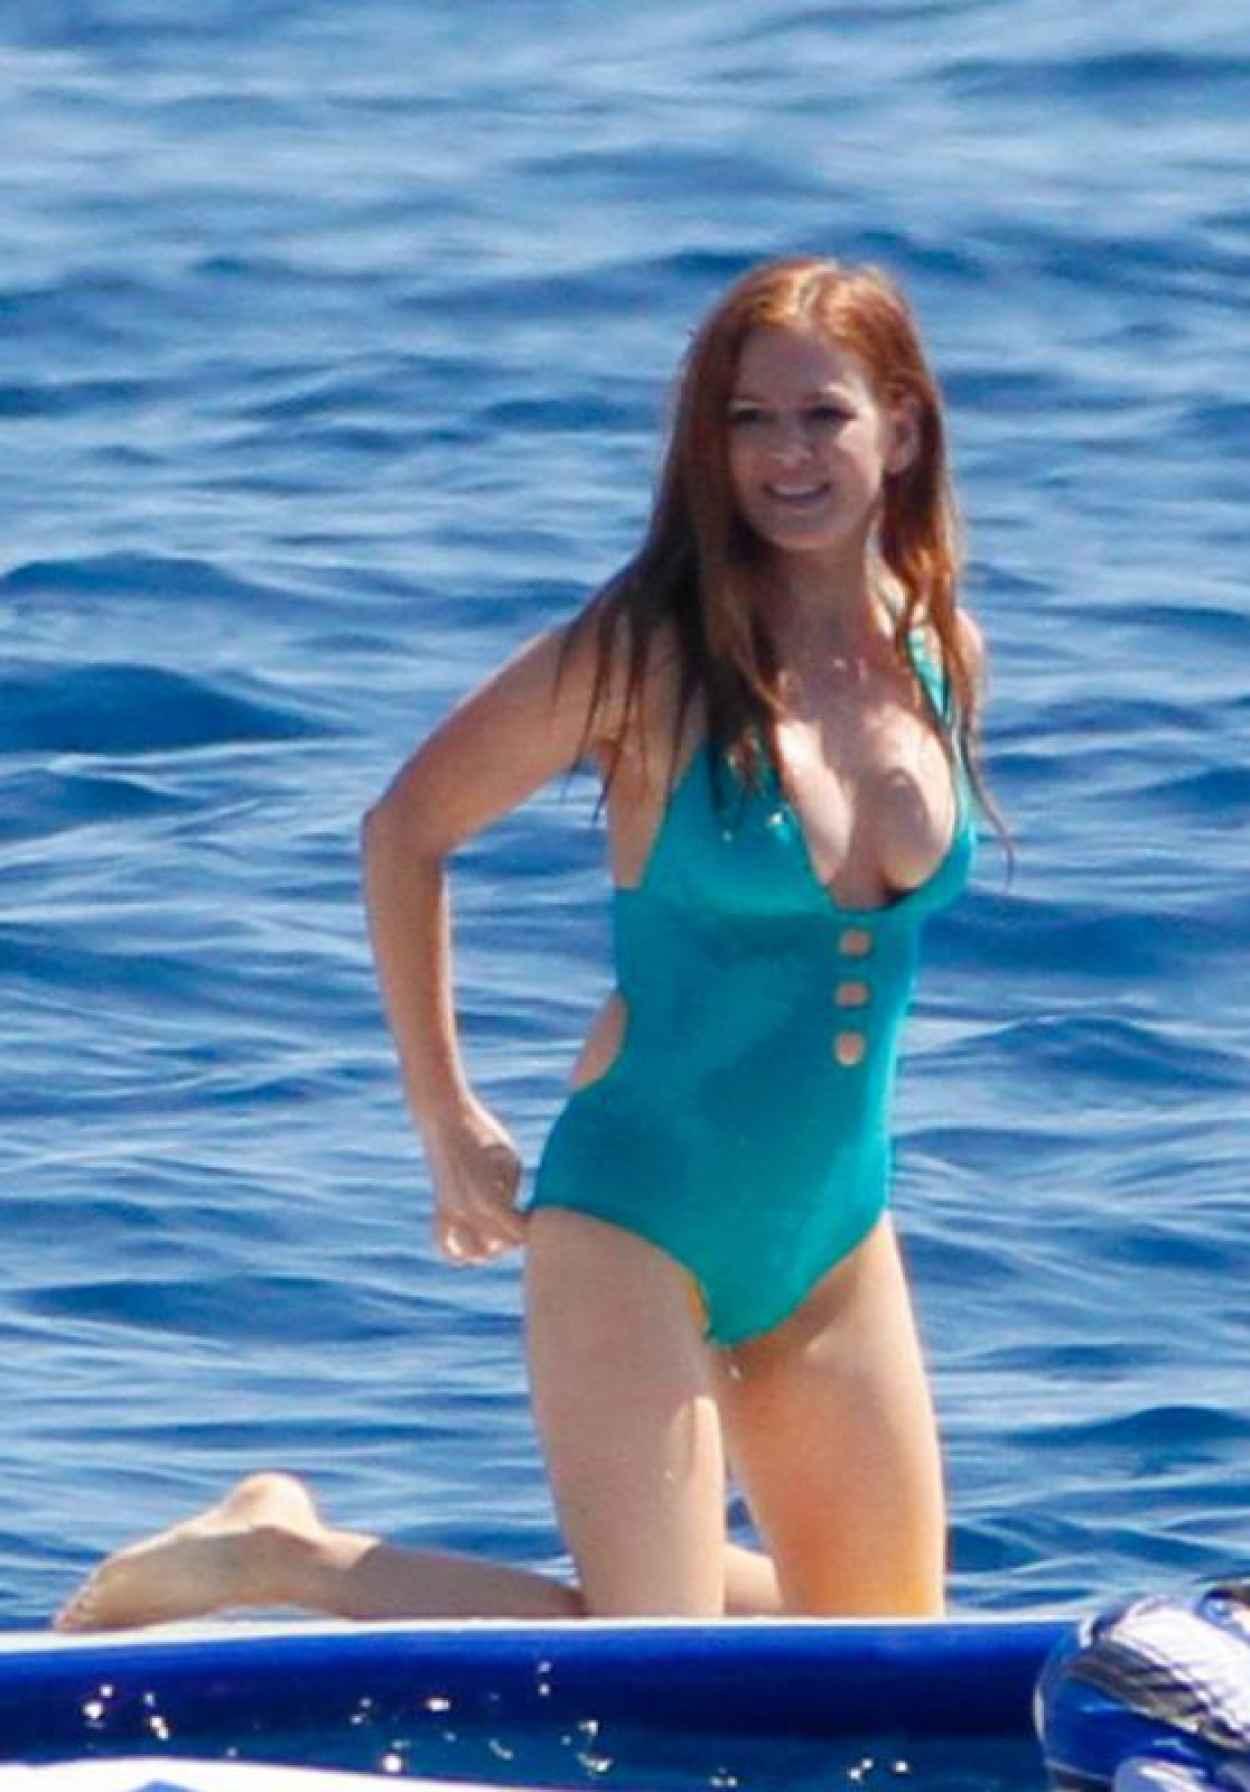 Avirl lavigne bikini